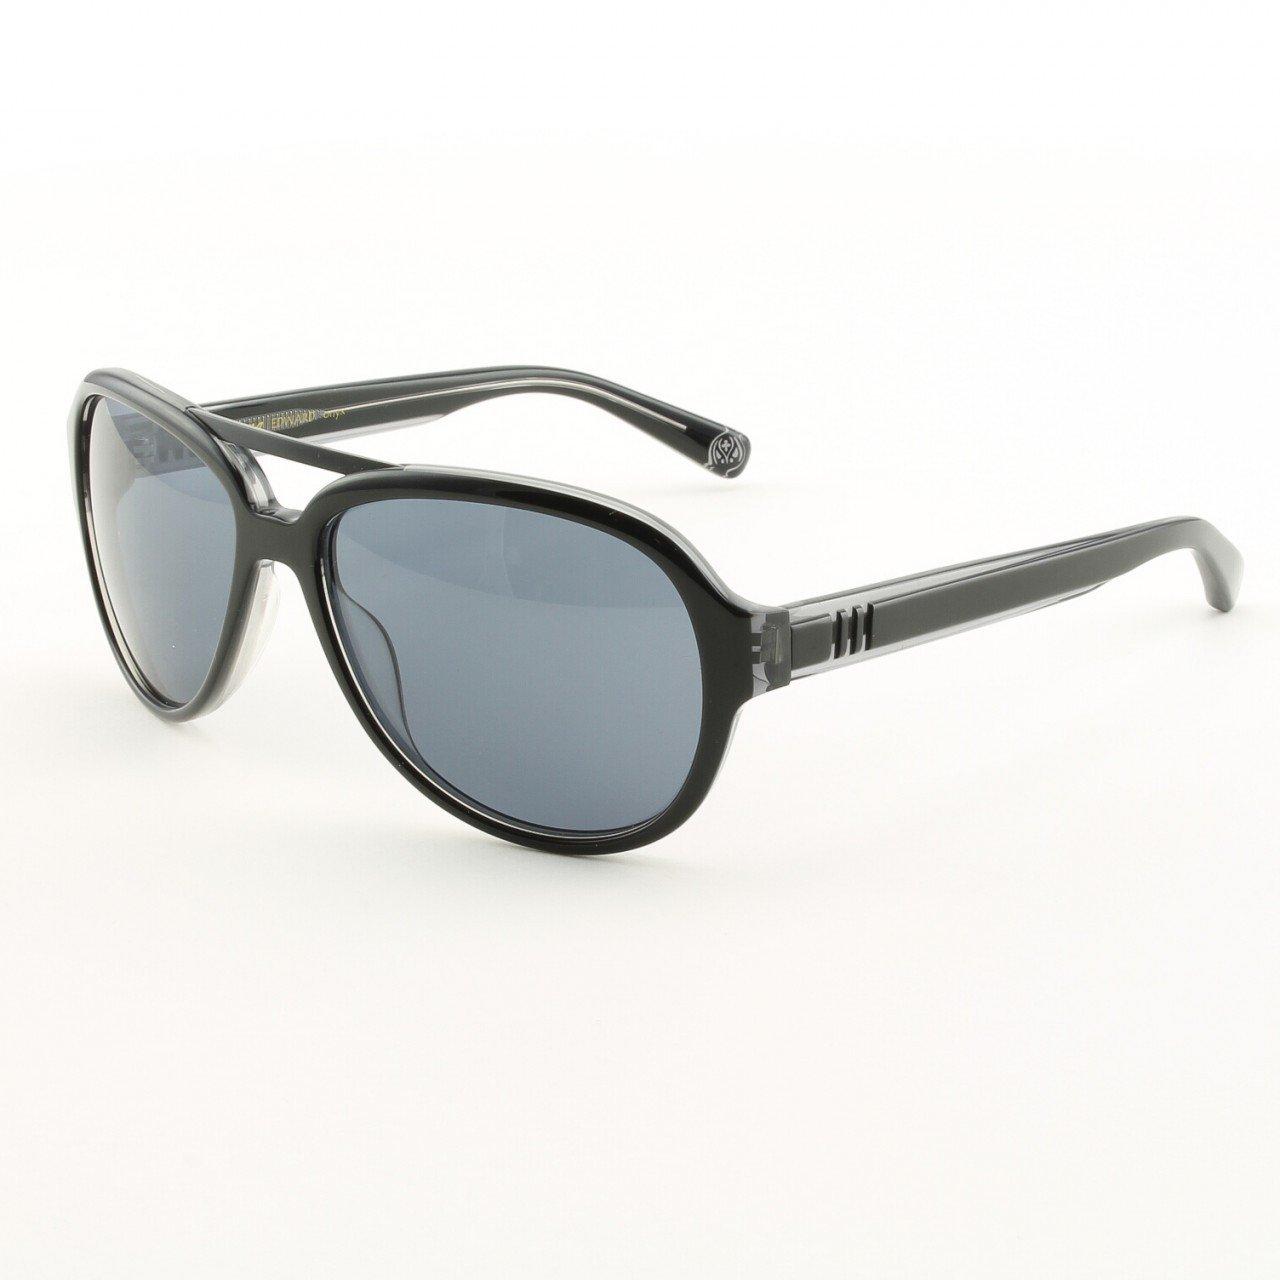 Loree Rodkin Edward Sunglasses by Sama Col. Onyx with Gray Lenses